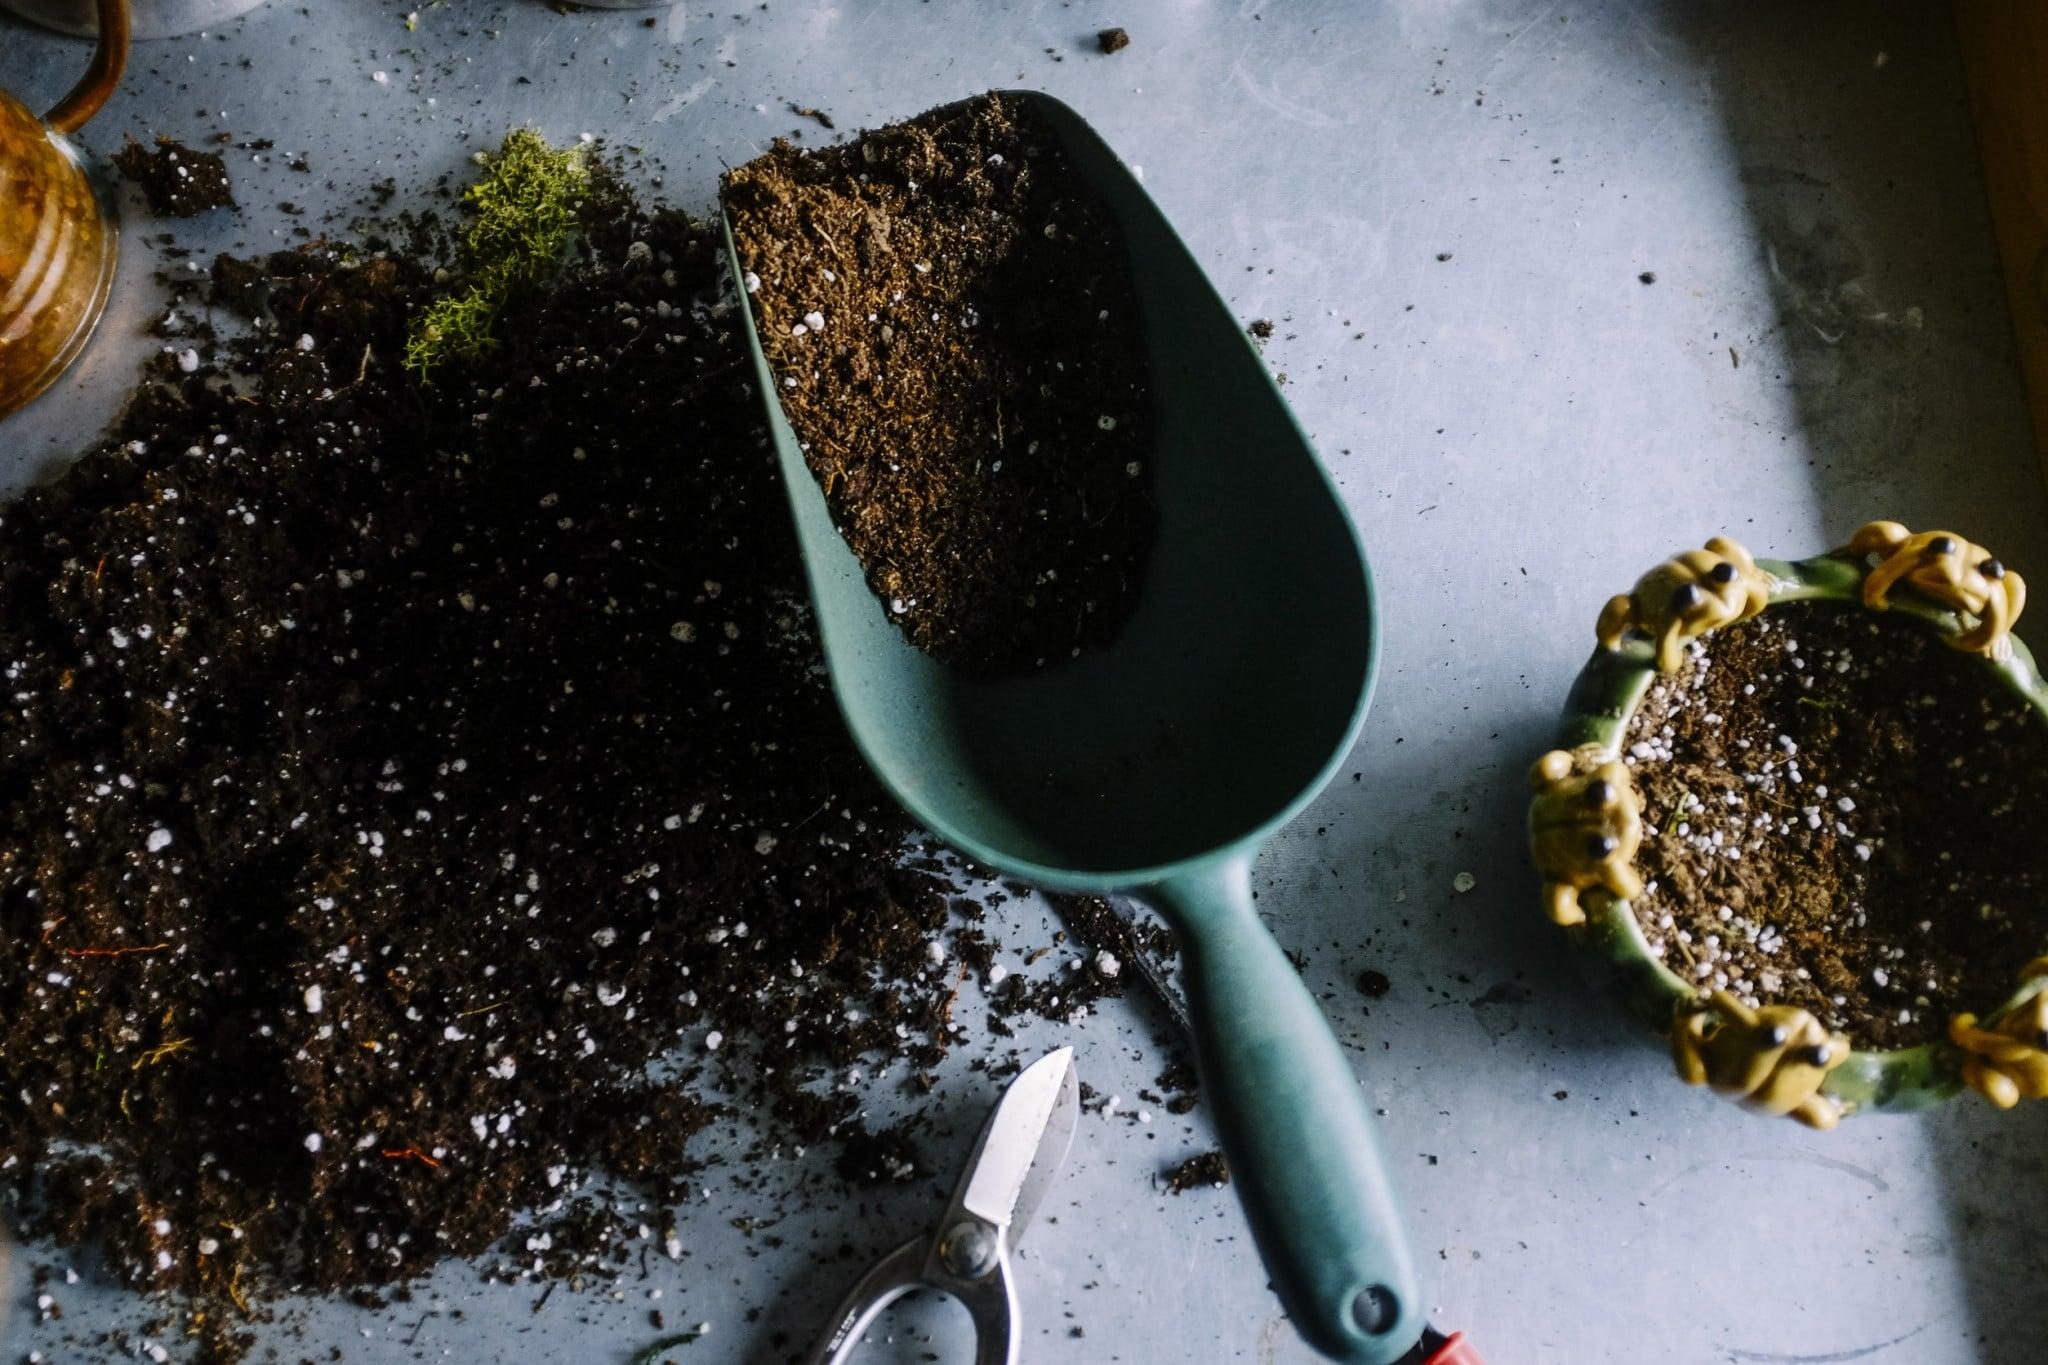 Canva Gardening Scoop and Soil 1 Moixa | Home Energy Storage | Smart Energy Management